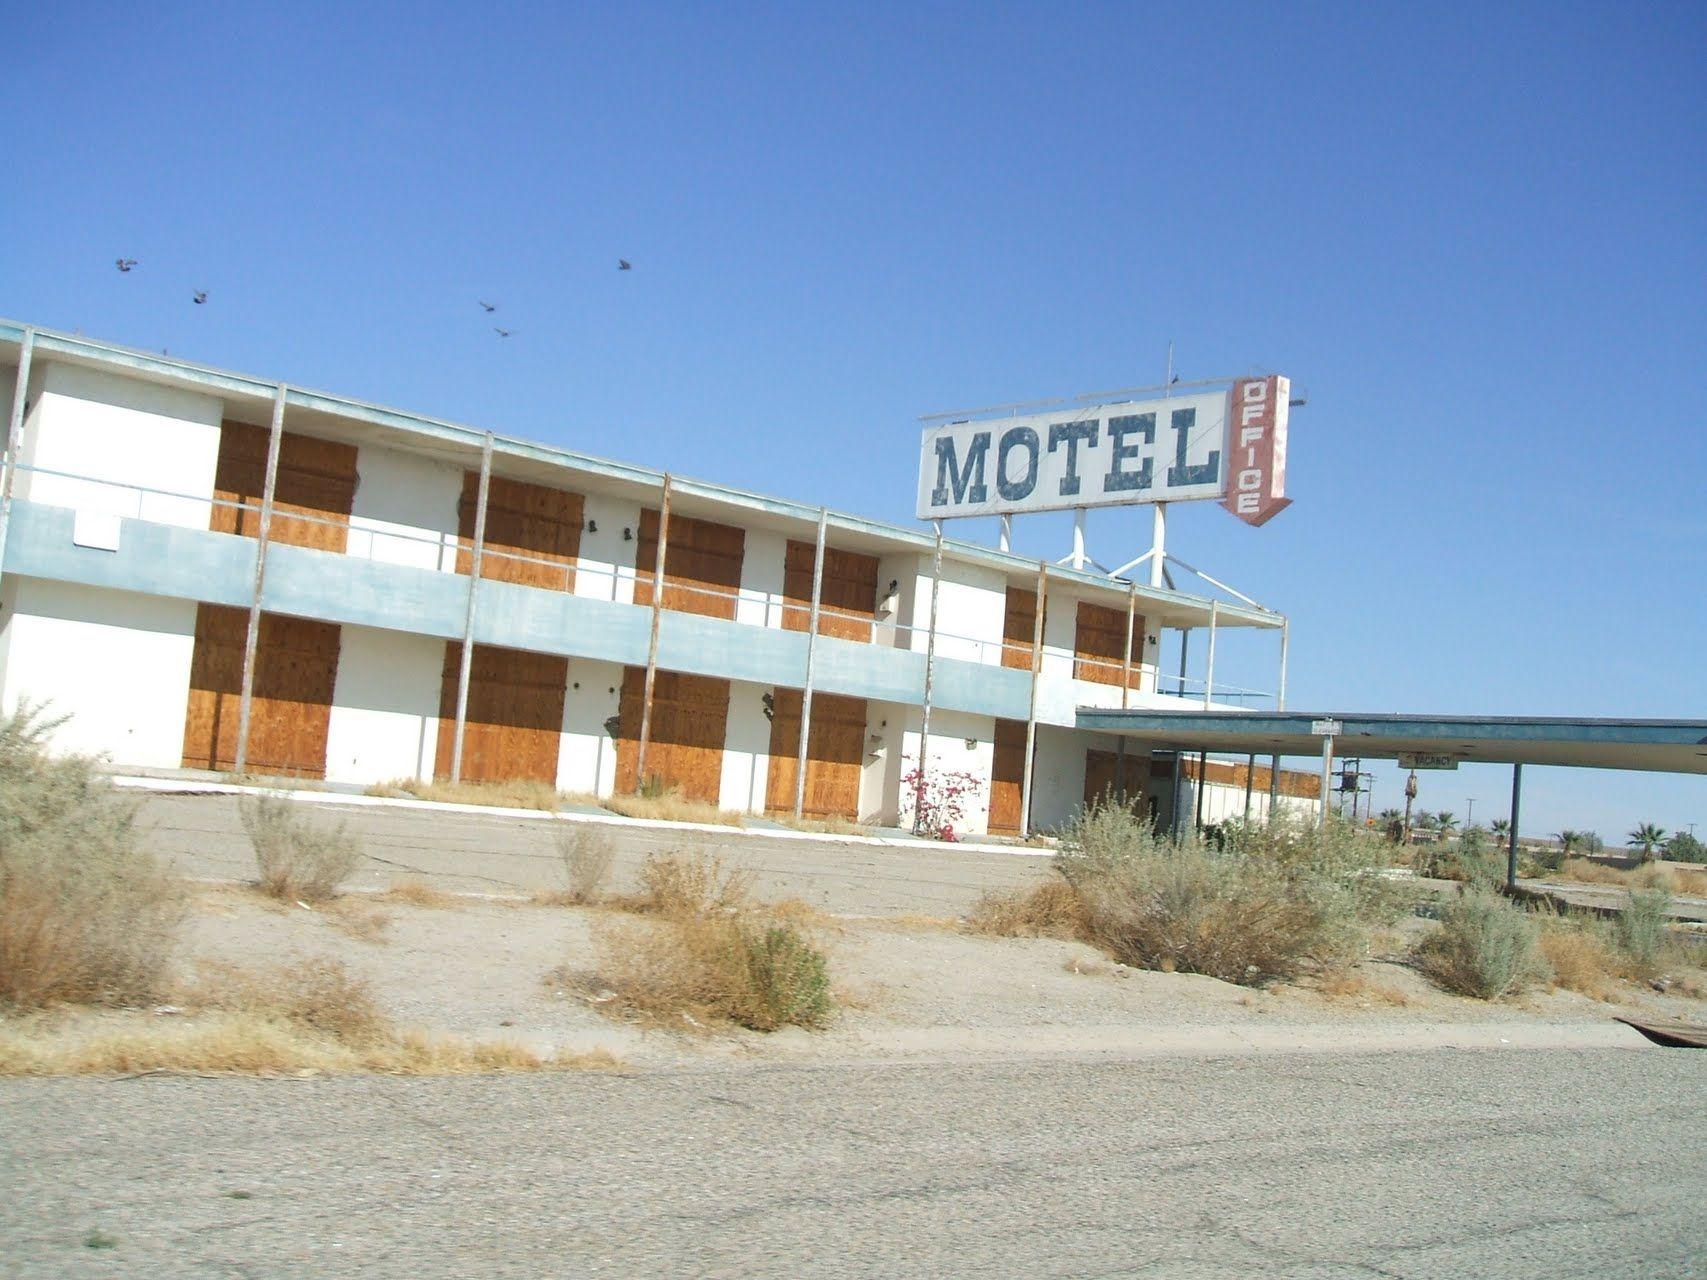 Old Motel | Abandoned/ruins | Motel, Palm springs, Abandoned